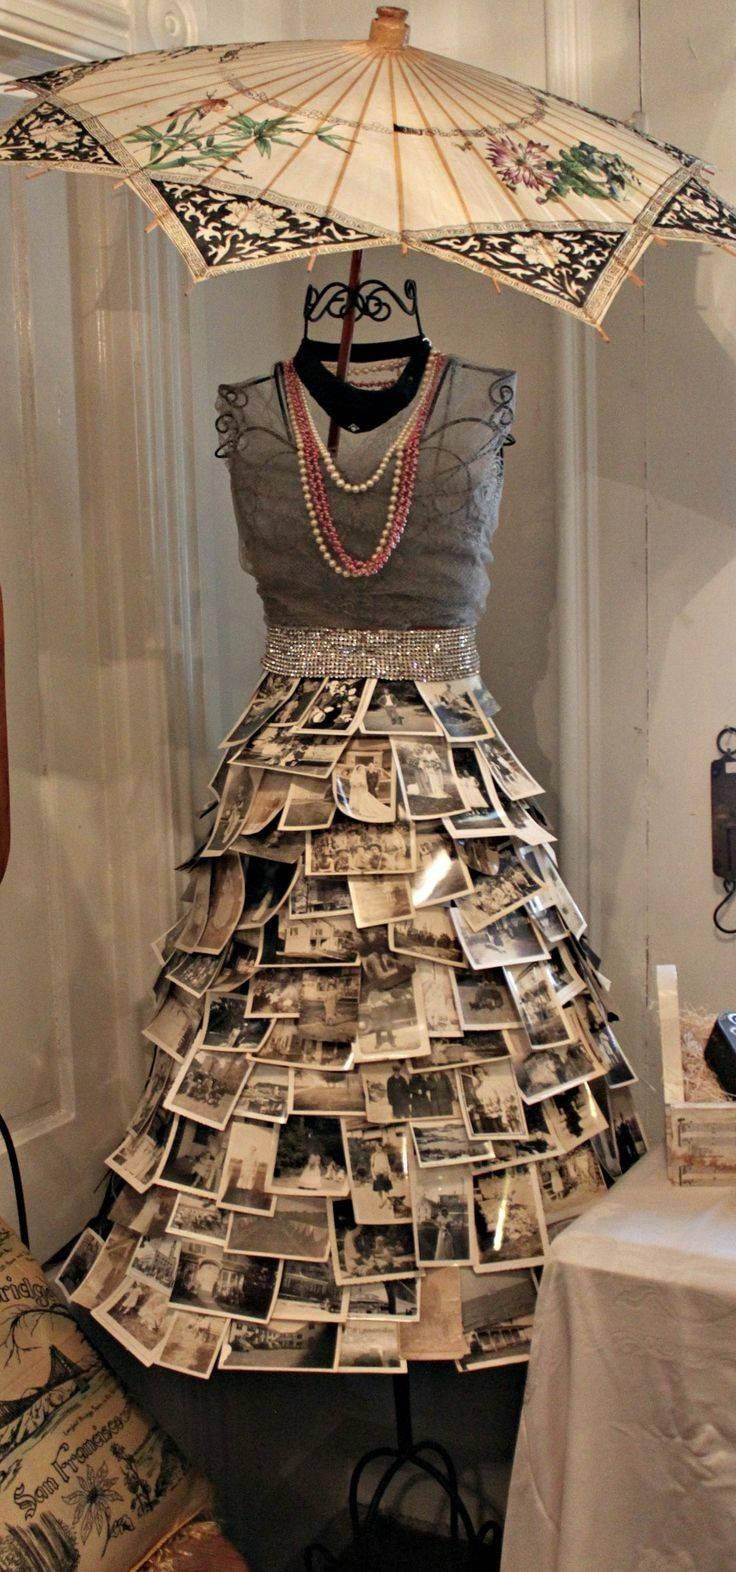 260 Best Art On Mannequins Images On Pinterest | Mannequin Art For Latest Mannequin Wall Art (View 1 of 20)